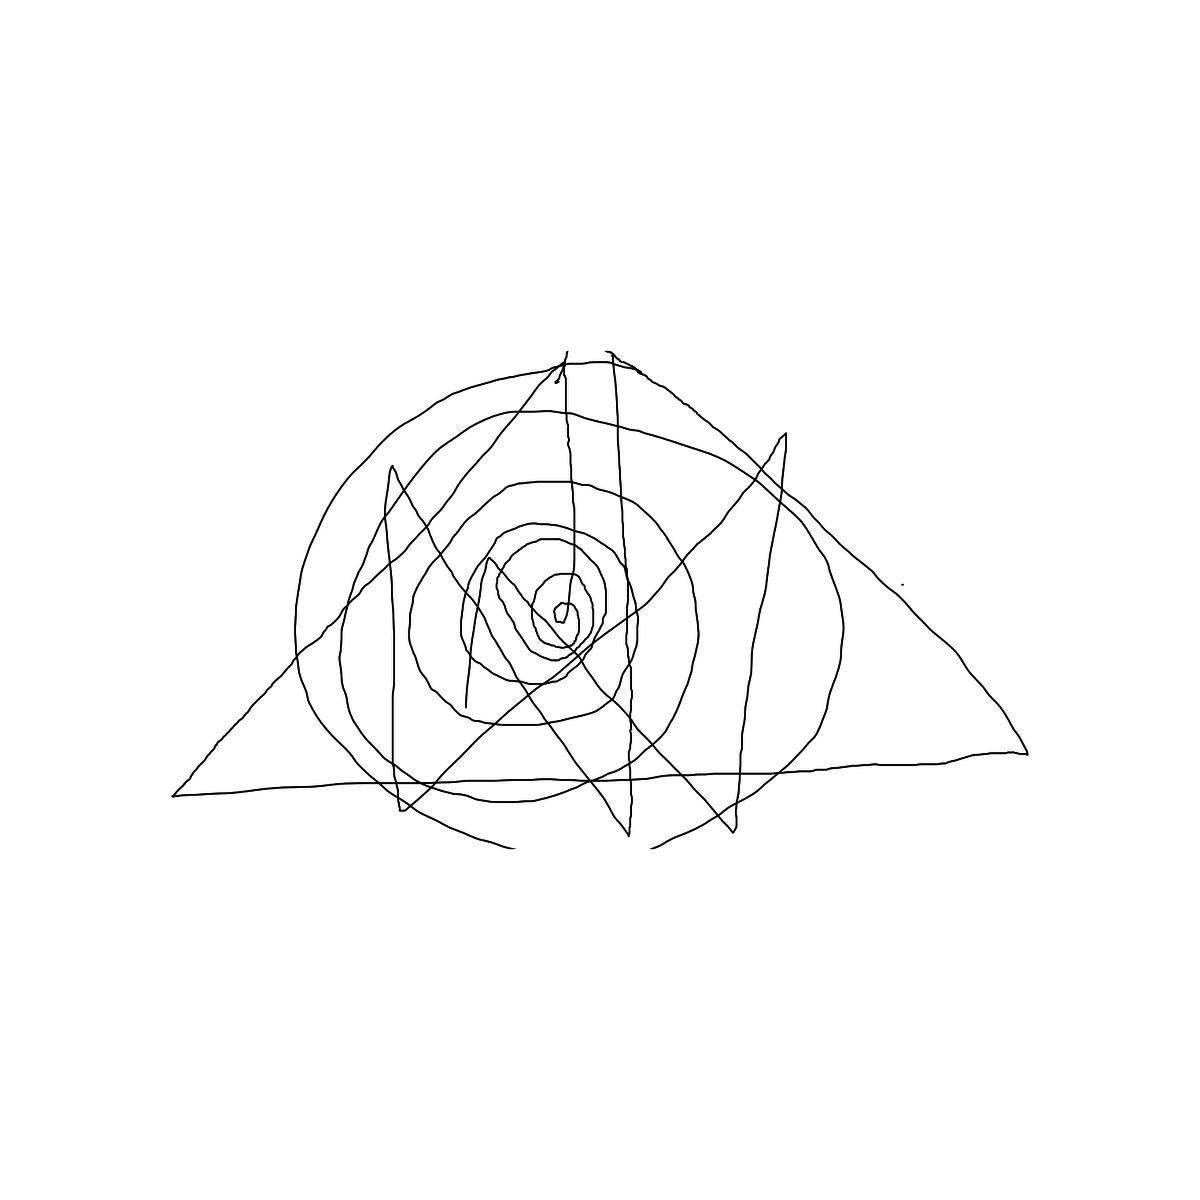 BAAAM drawing#10802 lat:53.3833312988281250lng: -88.0664138793945300